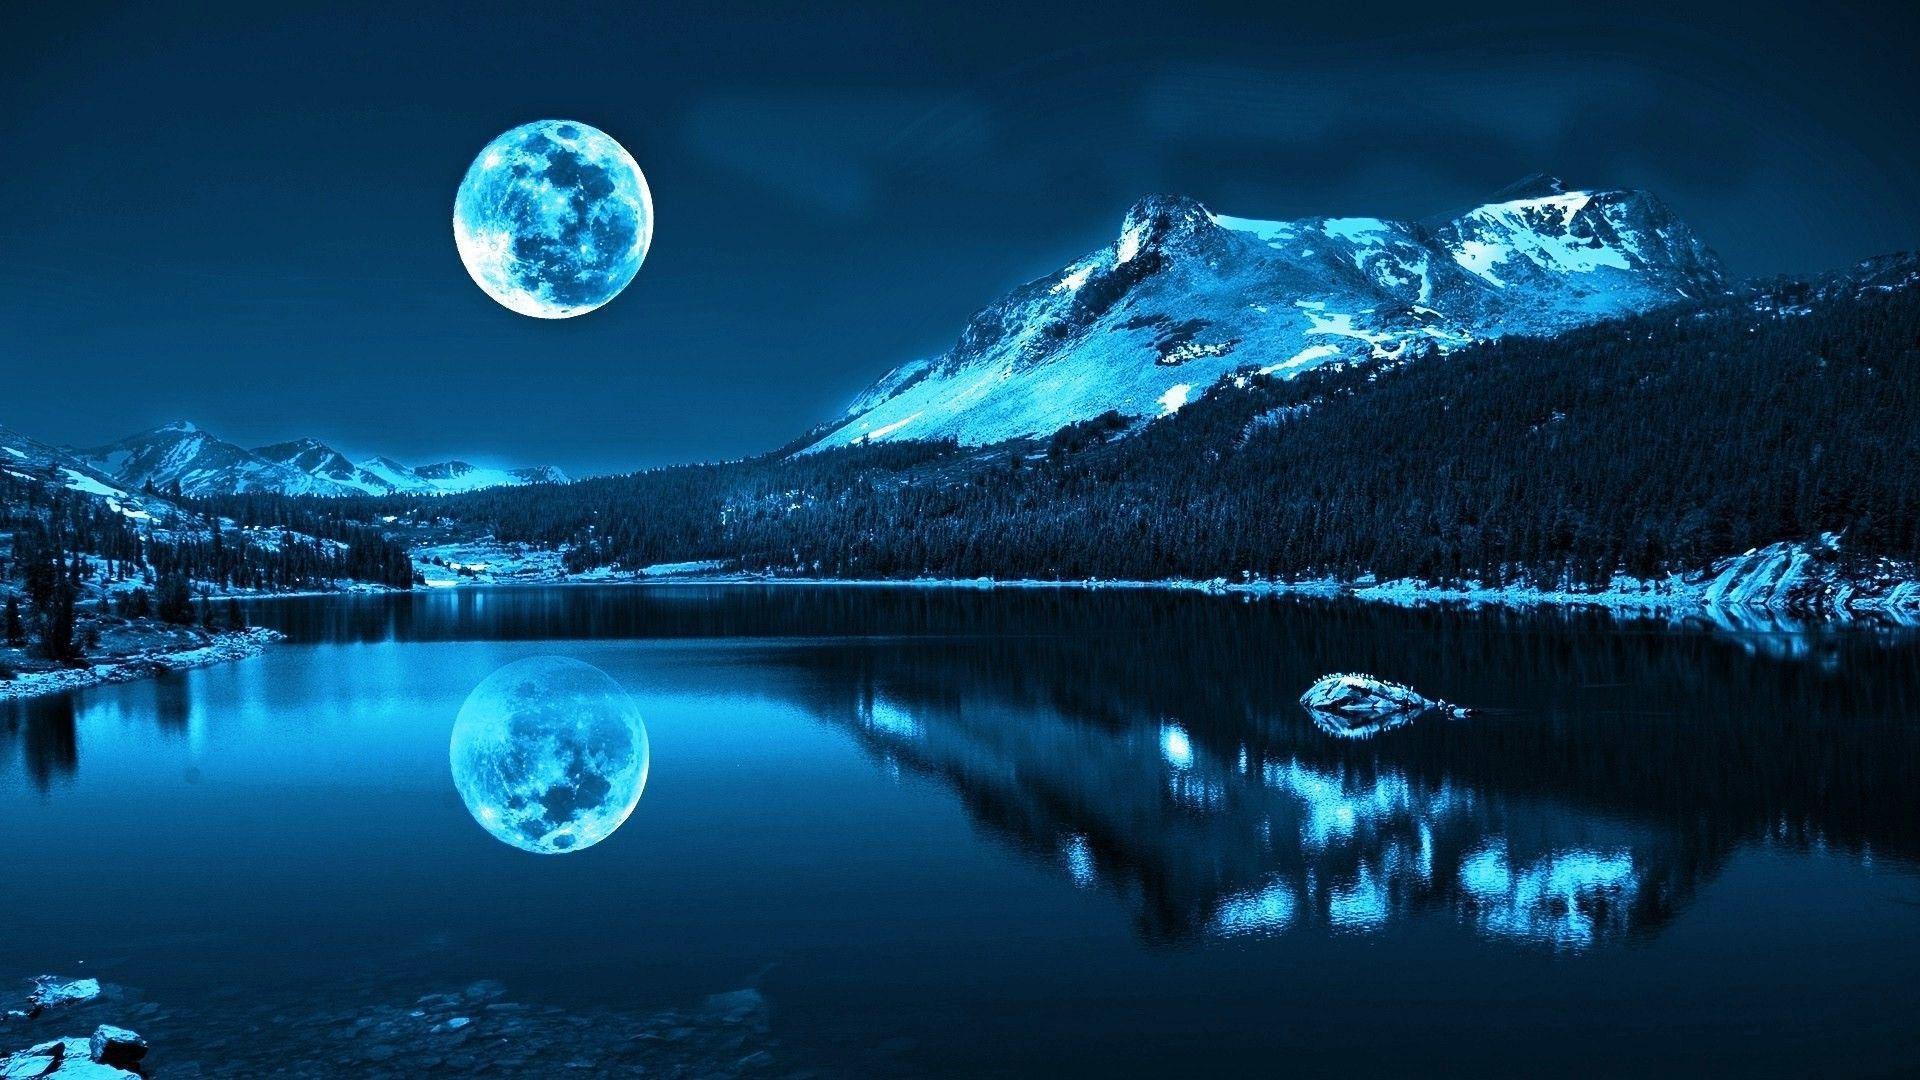 Moon Full Light Wallpapers Wallpaper Cave